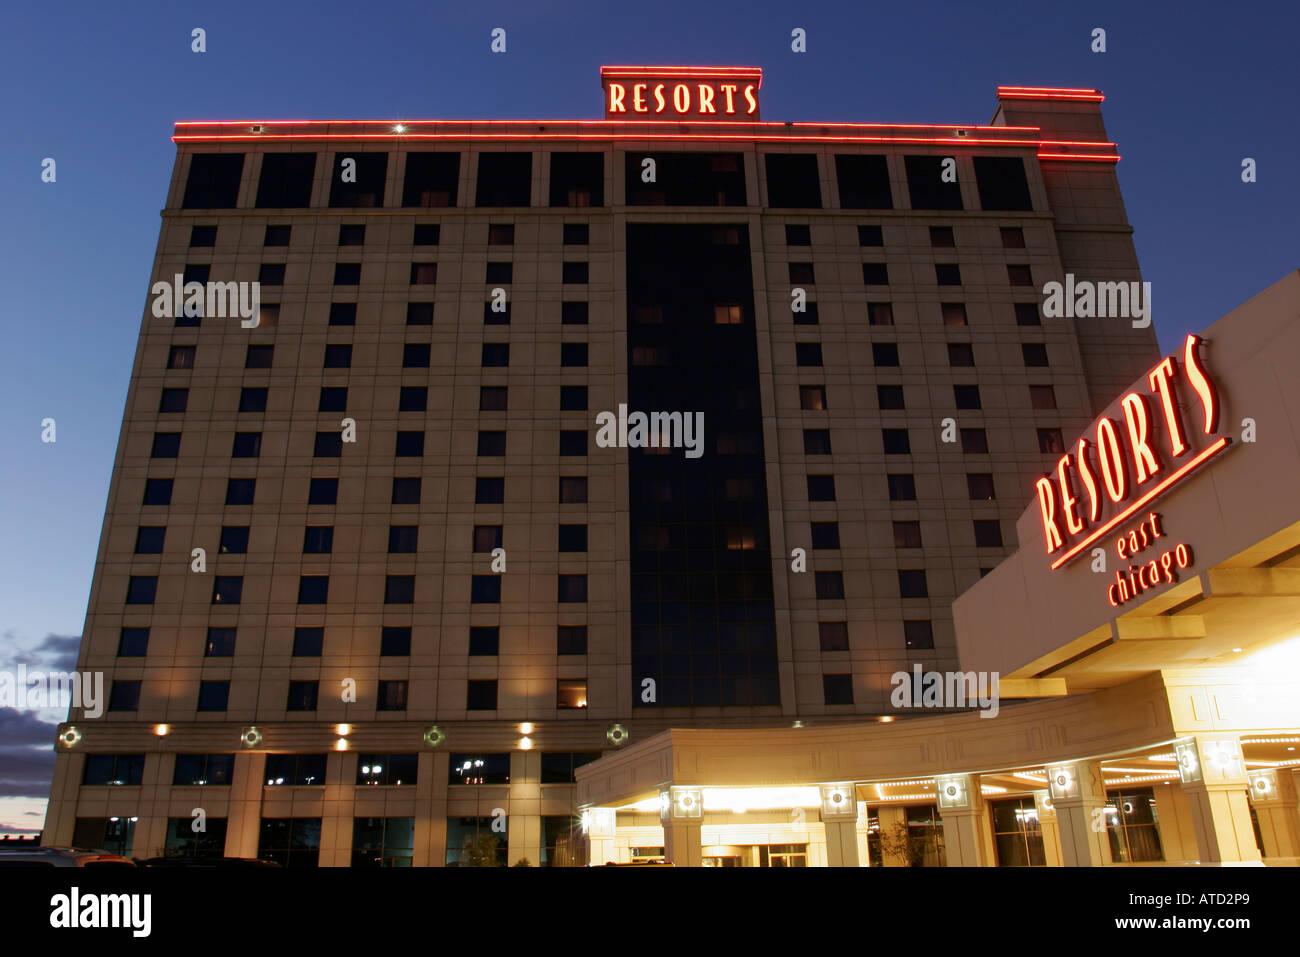 Casino chicago east download astraware casino